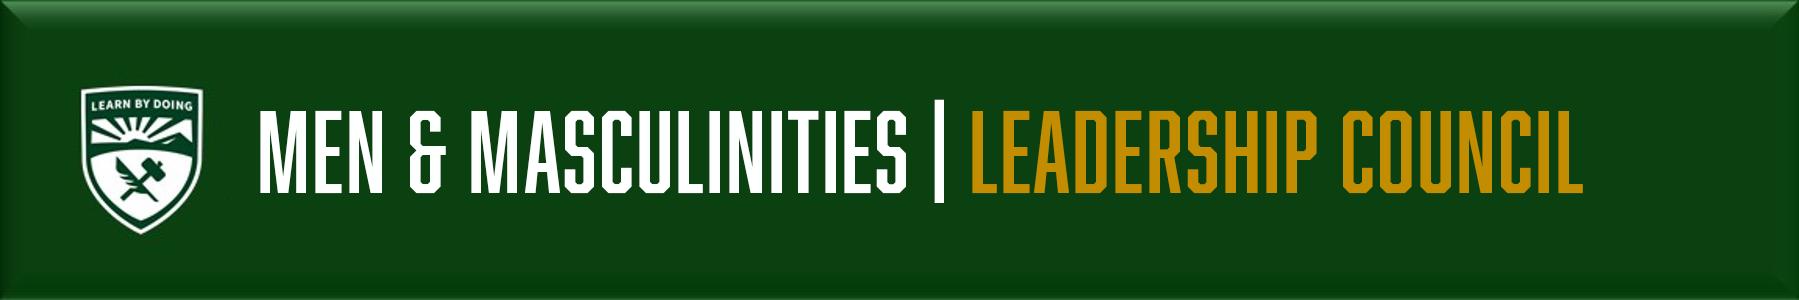 Men & Masculinities - Leadership Council